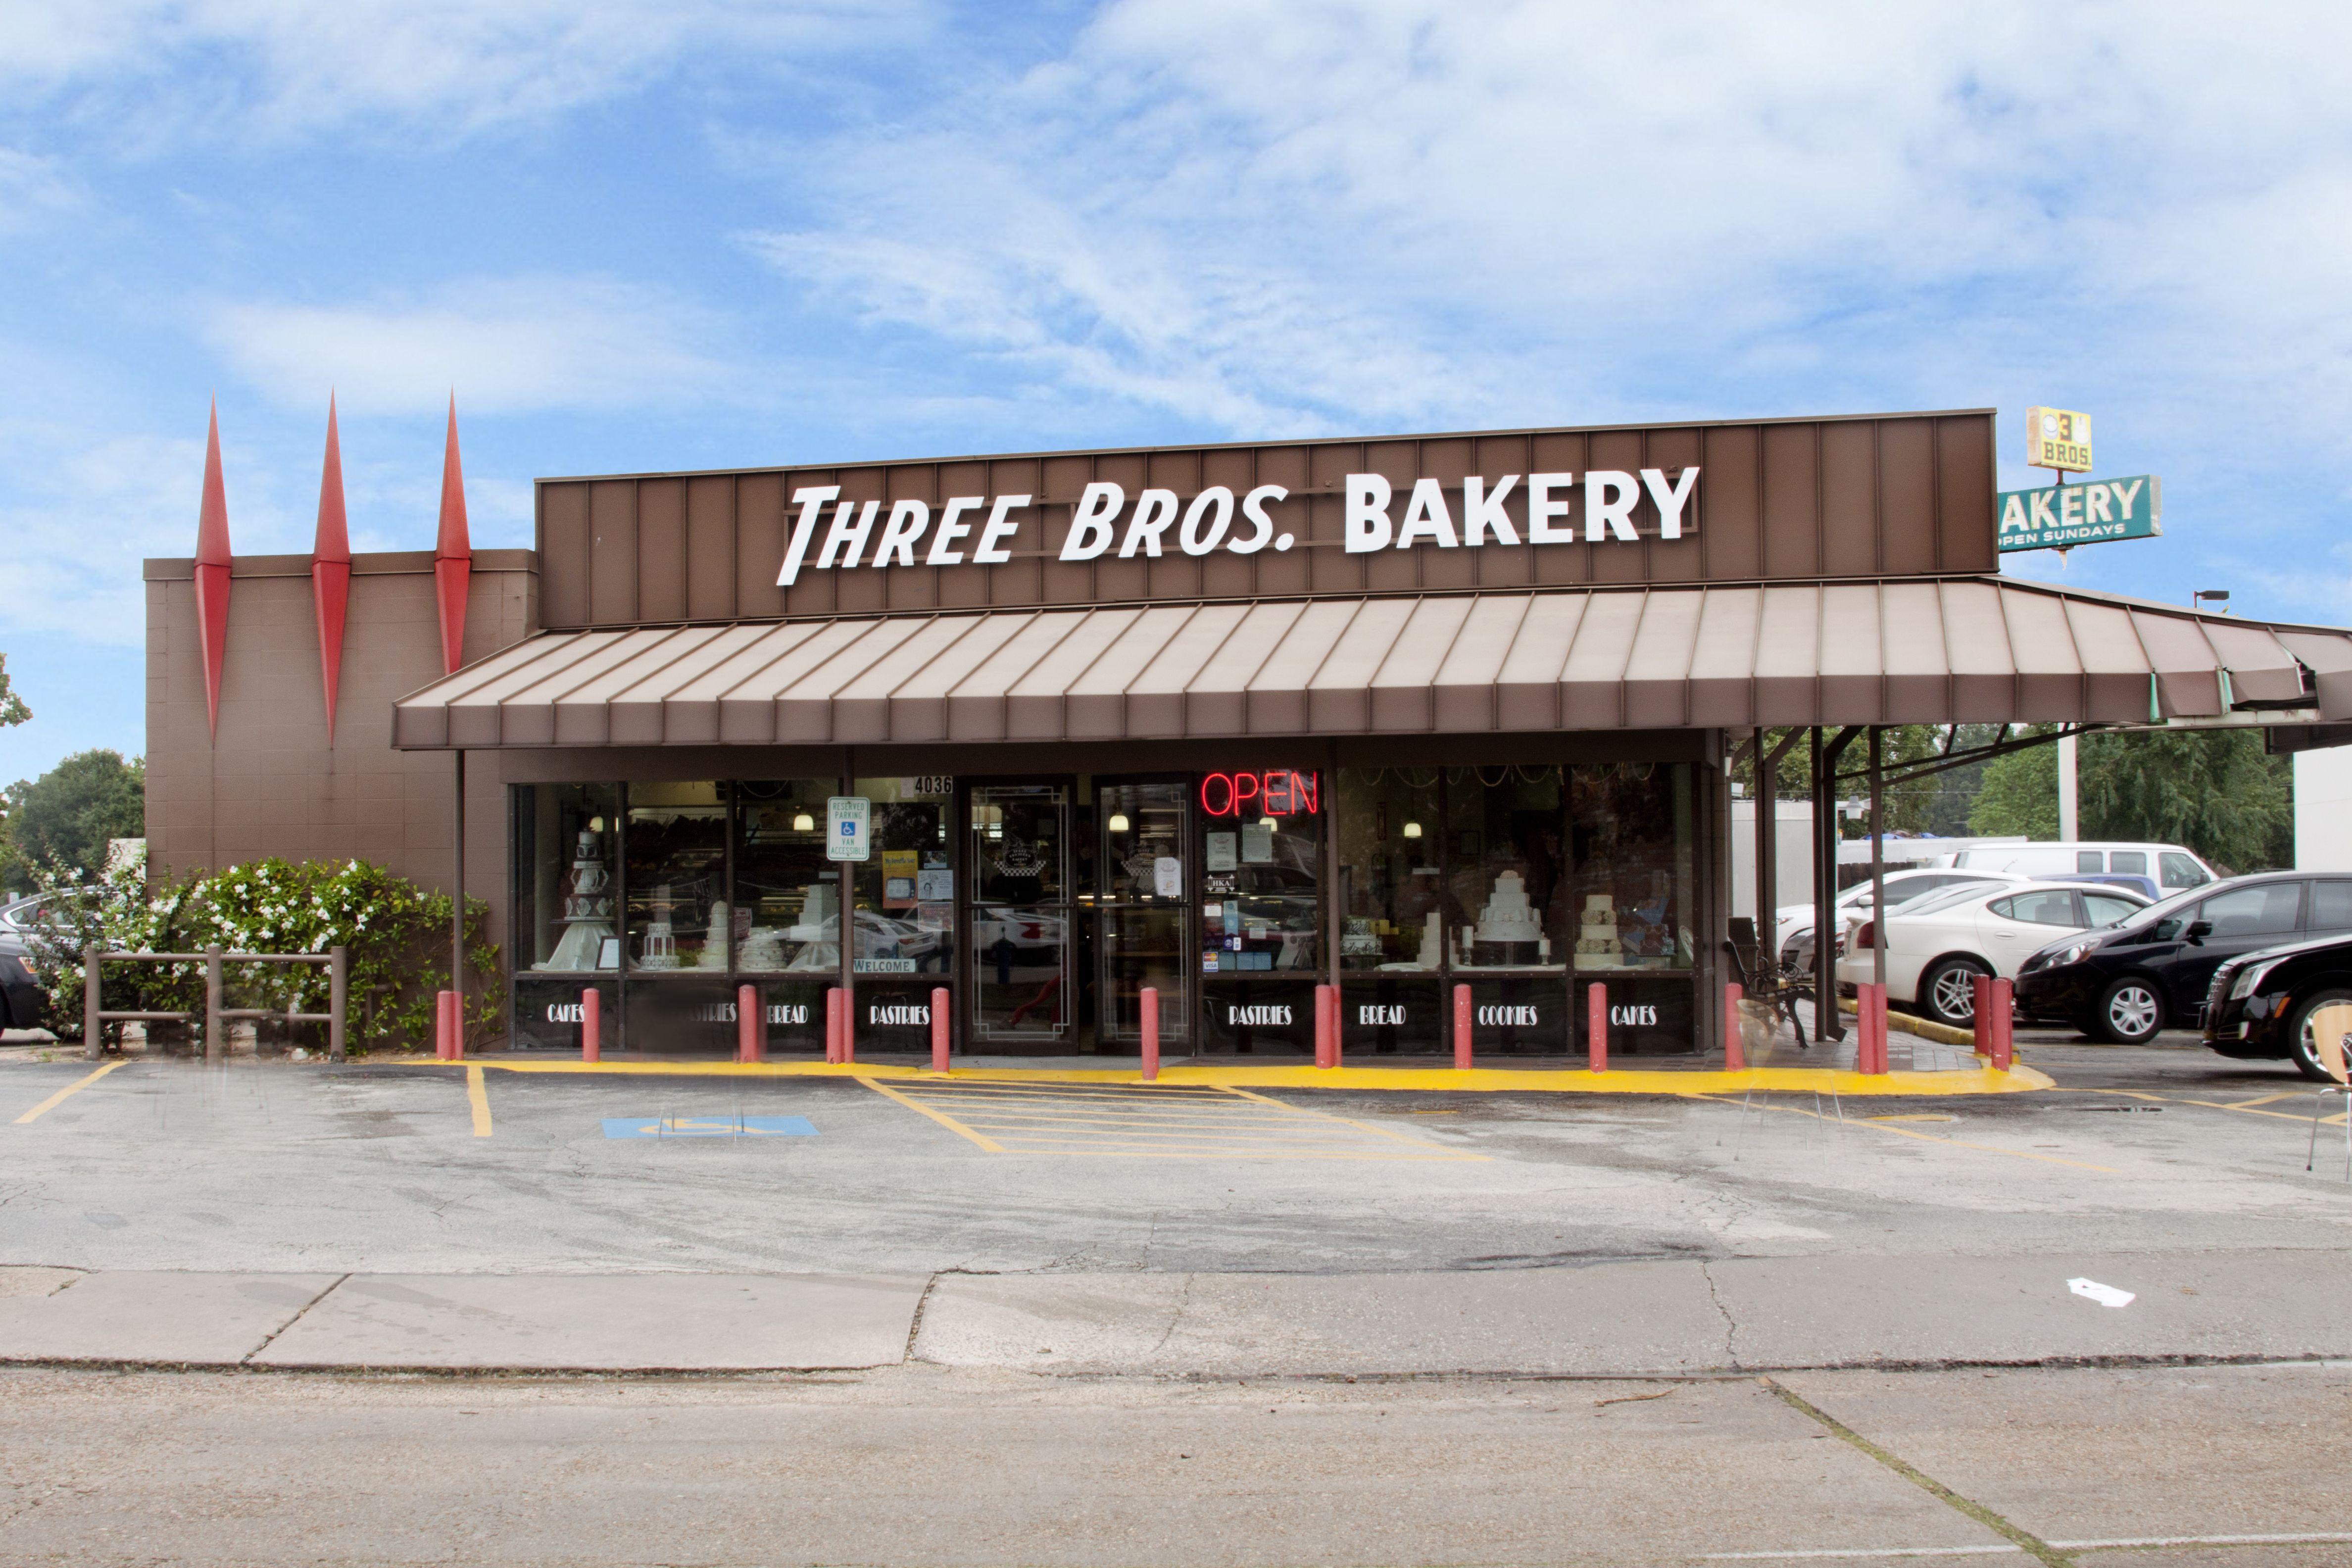 Locations Hours Three Brothers Bakery Houston Tx San Antonio Travel Brothers Bakery Houston Locations